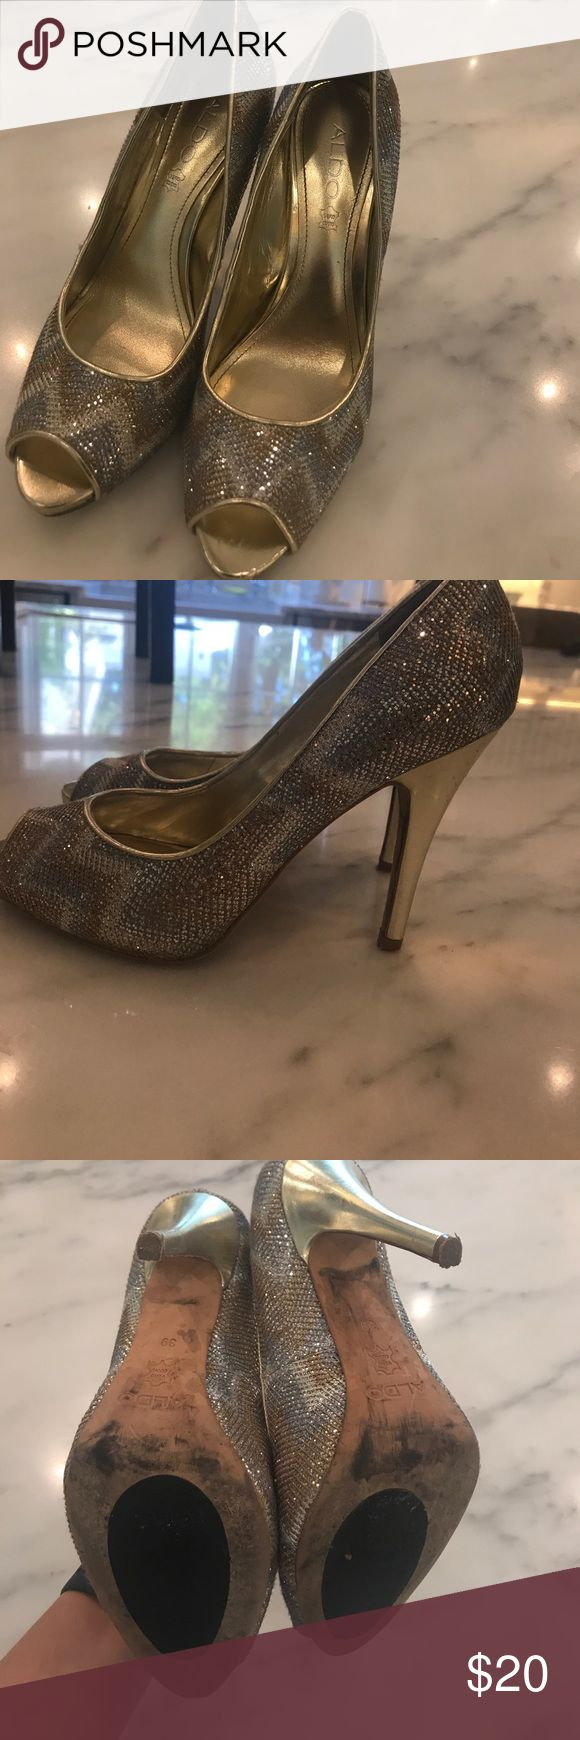 ALDO Heels EUC silver gold and white glitter chevron print Aldo Shoes Heels